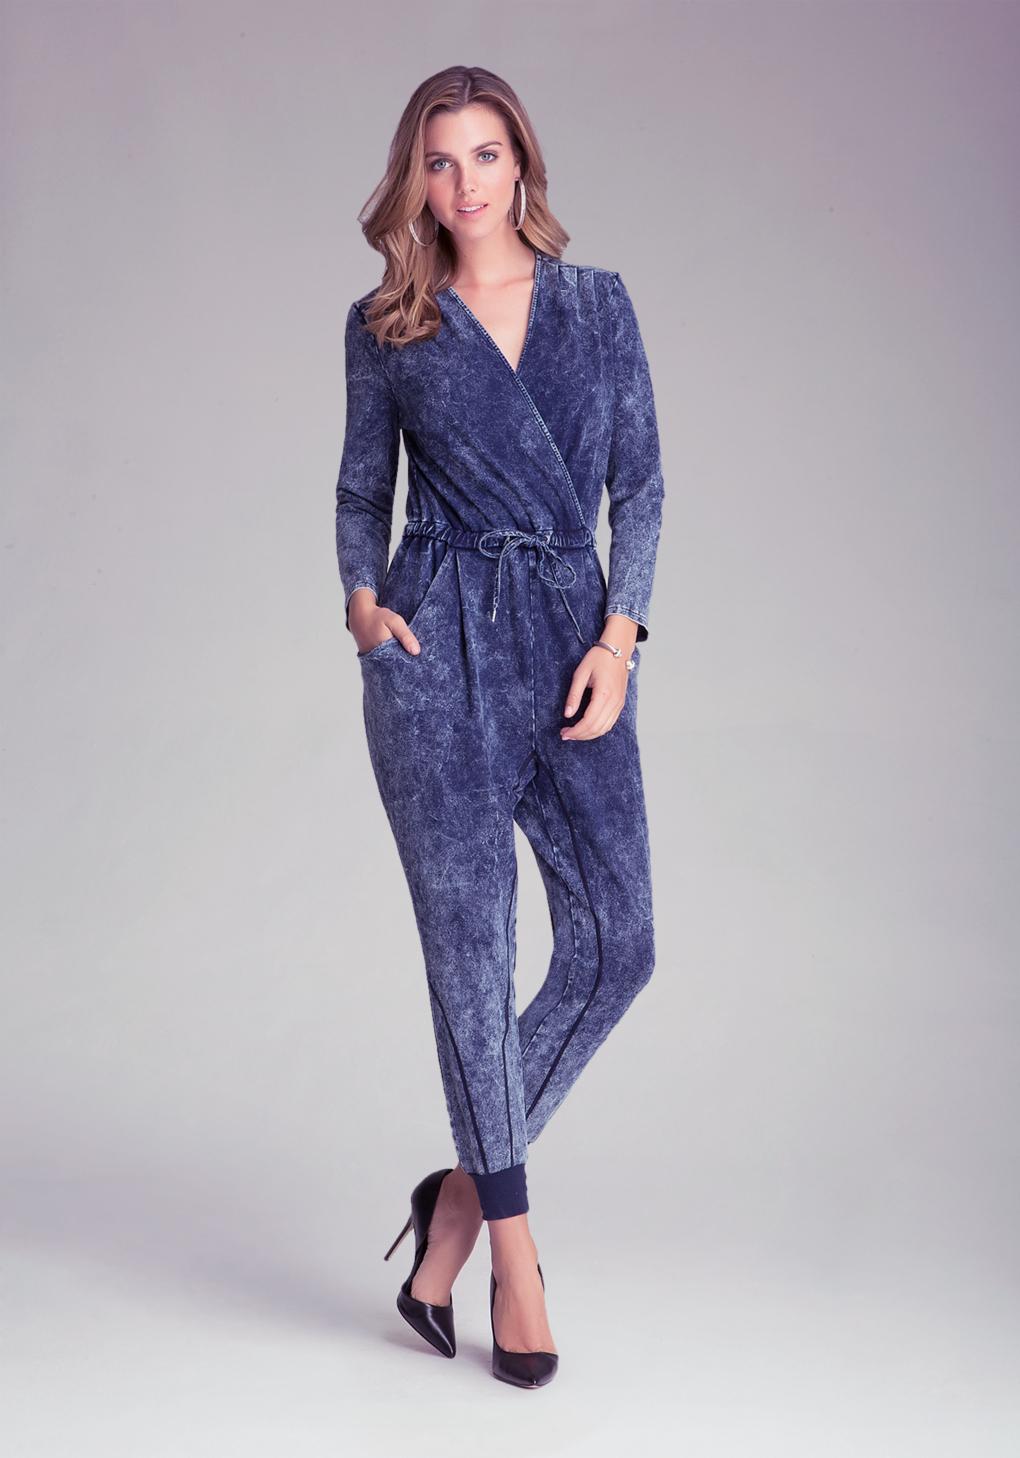 Bebe denim knit jumpsuit in blue lyst gallery ombrellifo Images